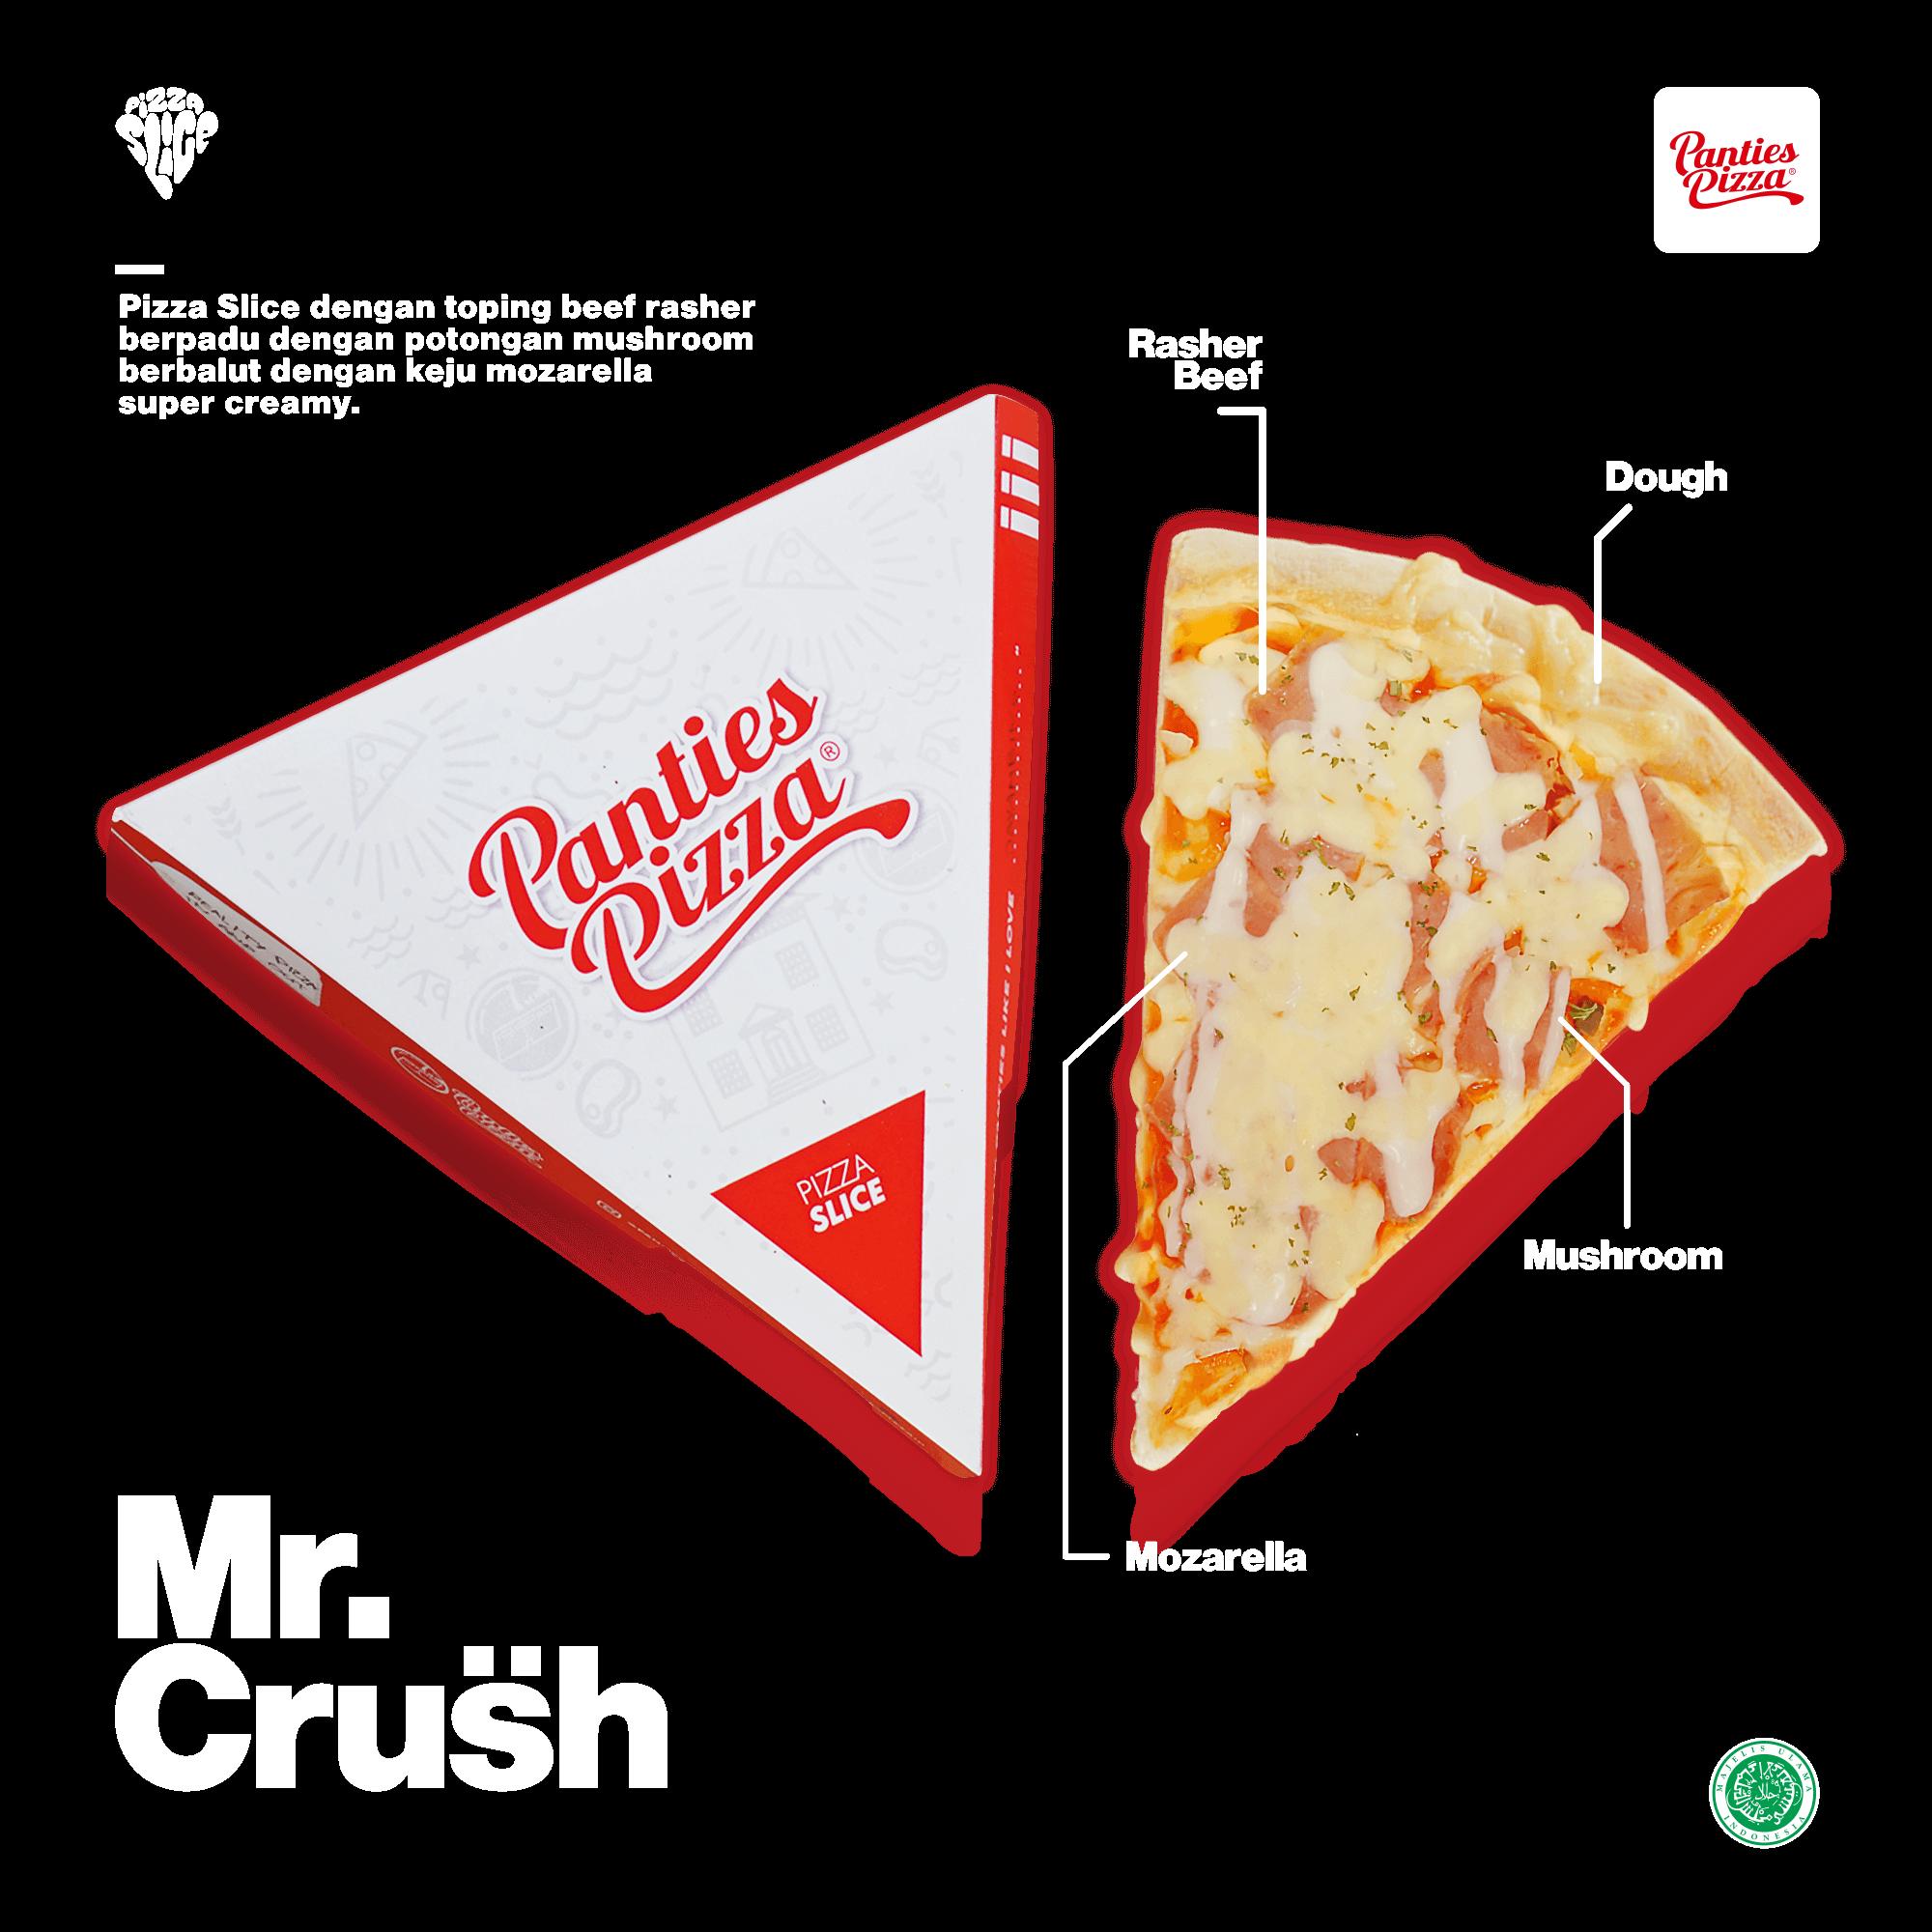 Mr Crush